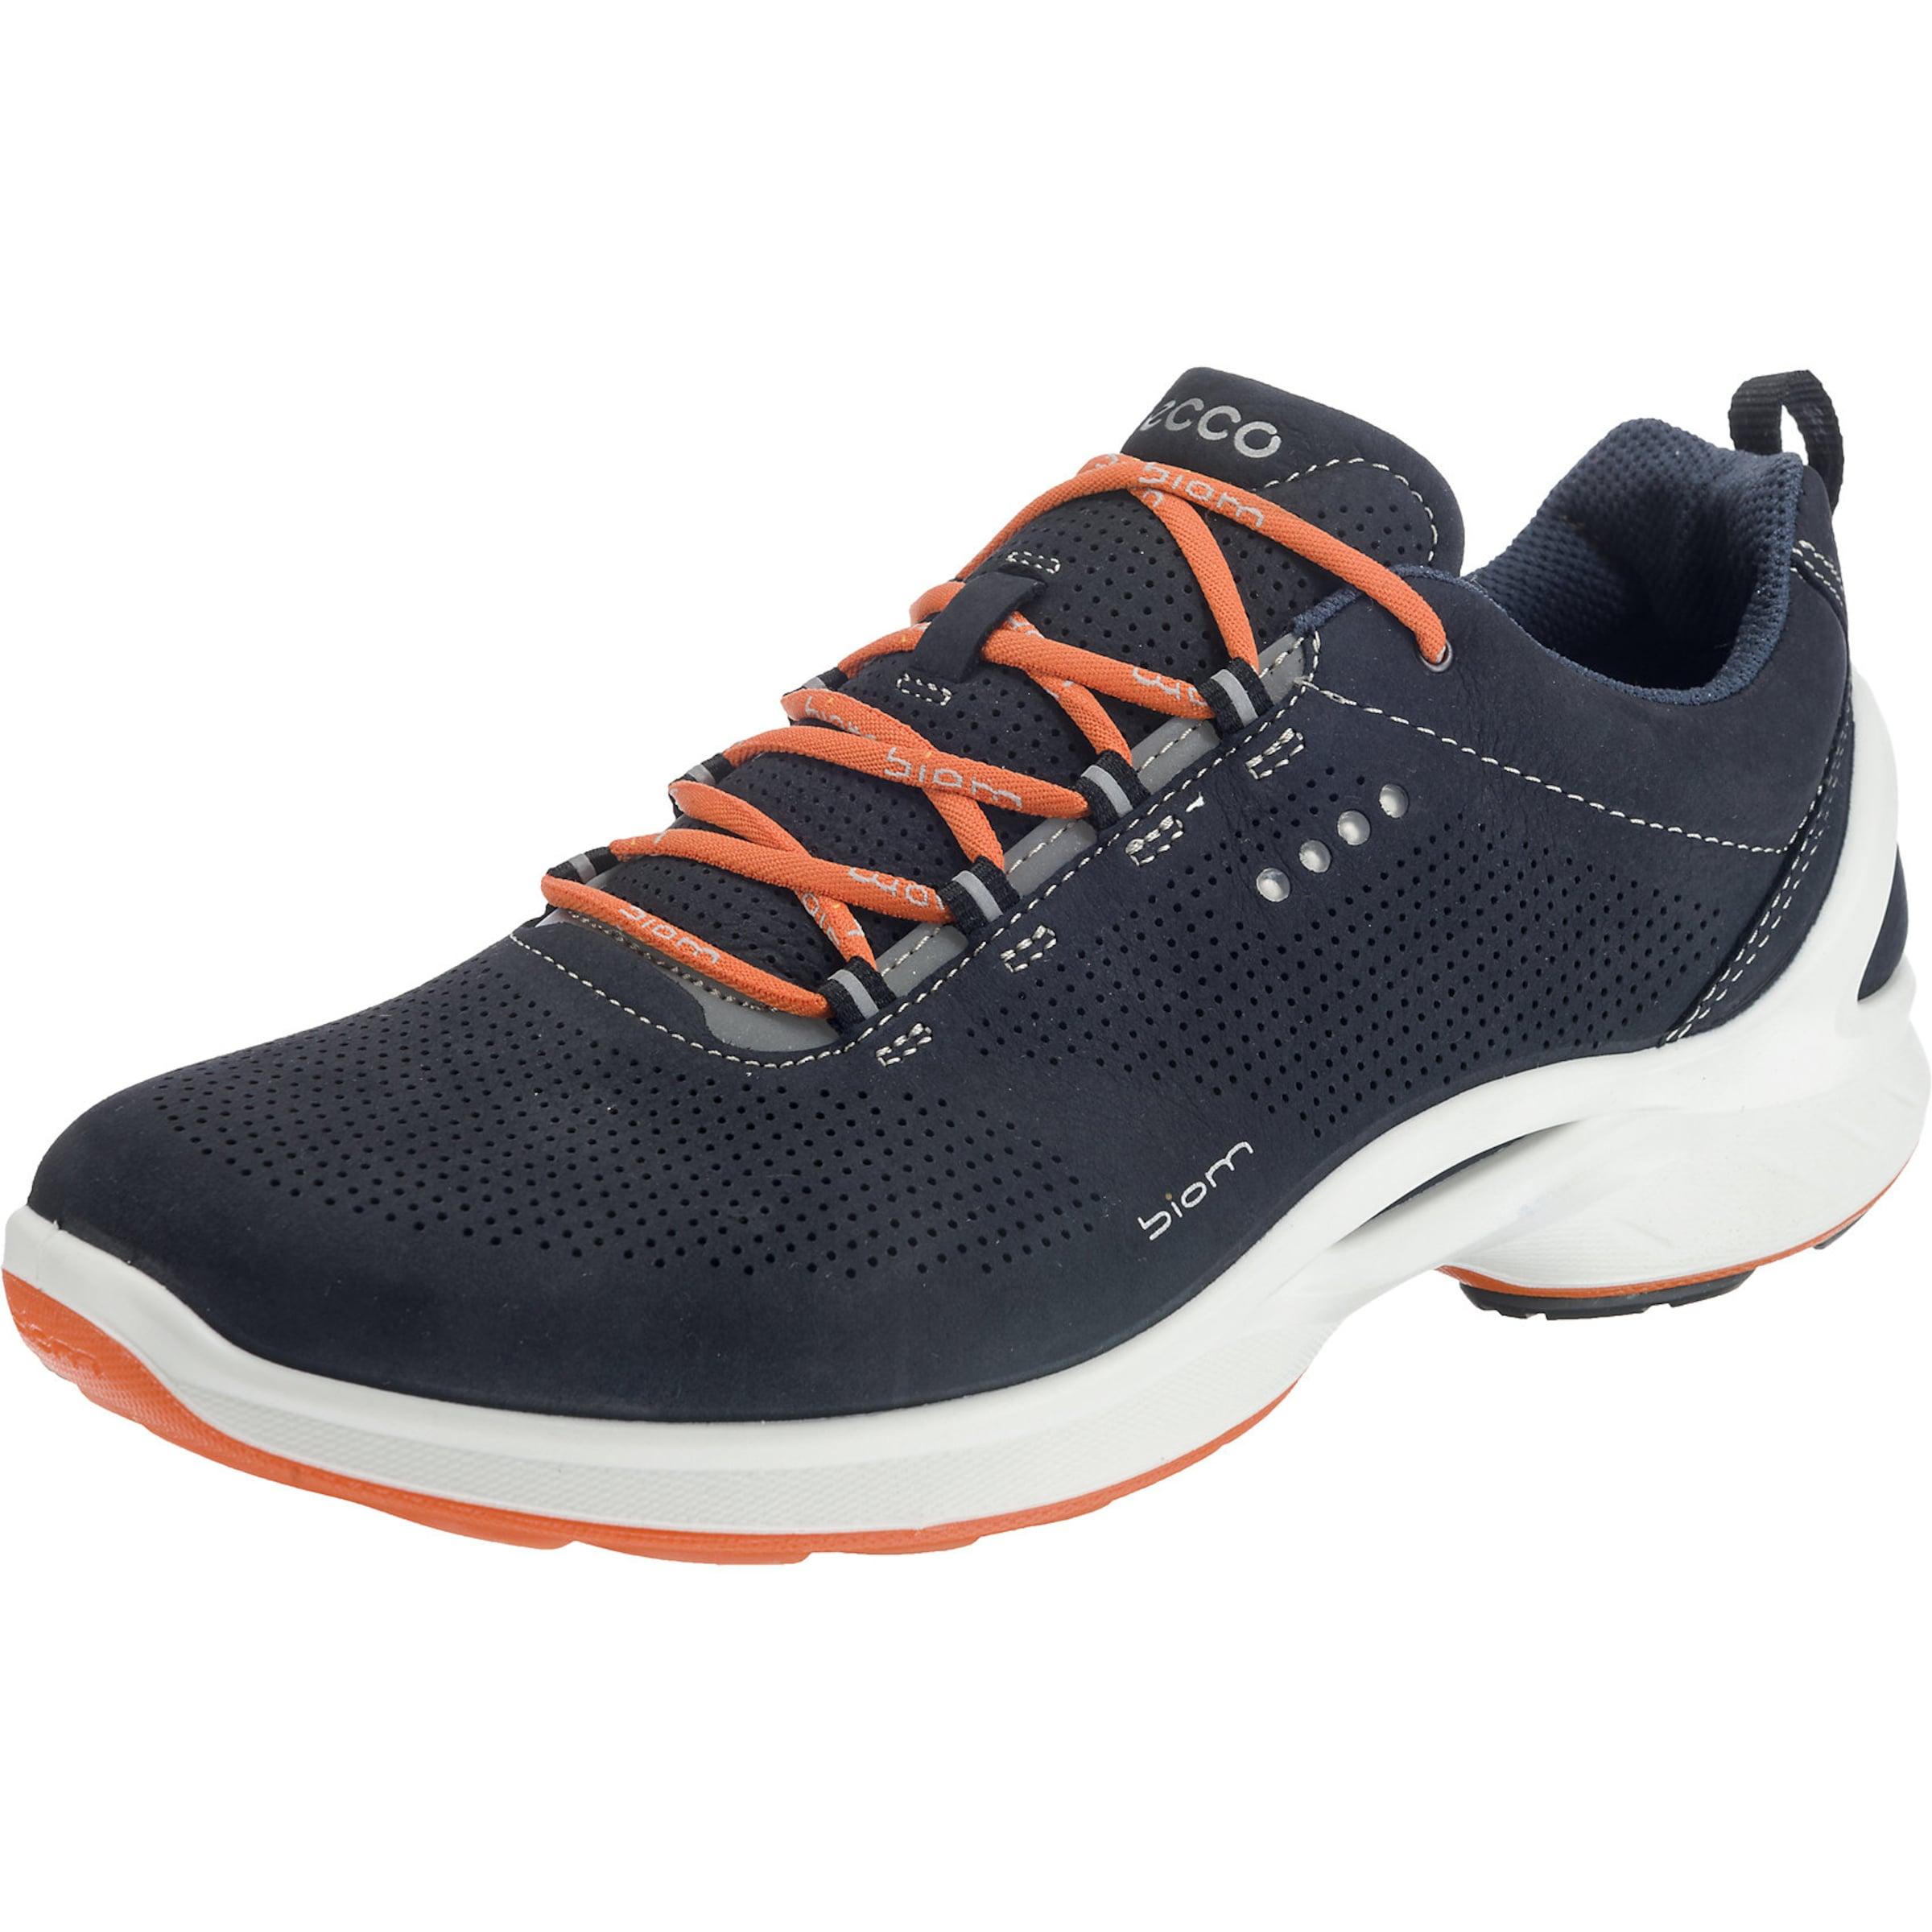 ECCO Sneakers Low Biom Fjuel Hohe Qualität